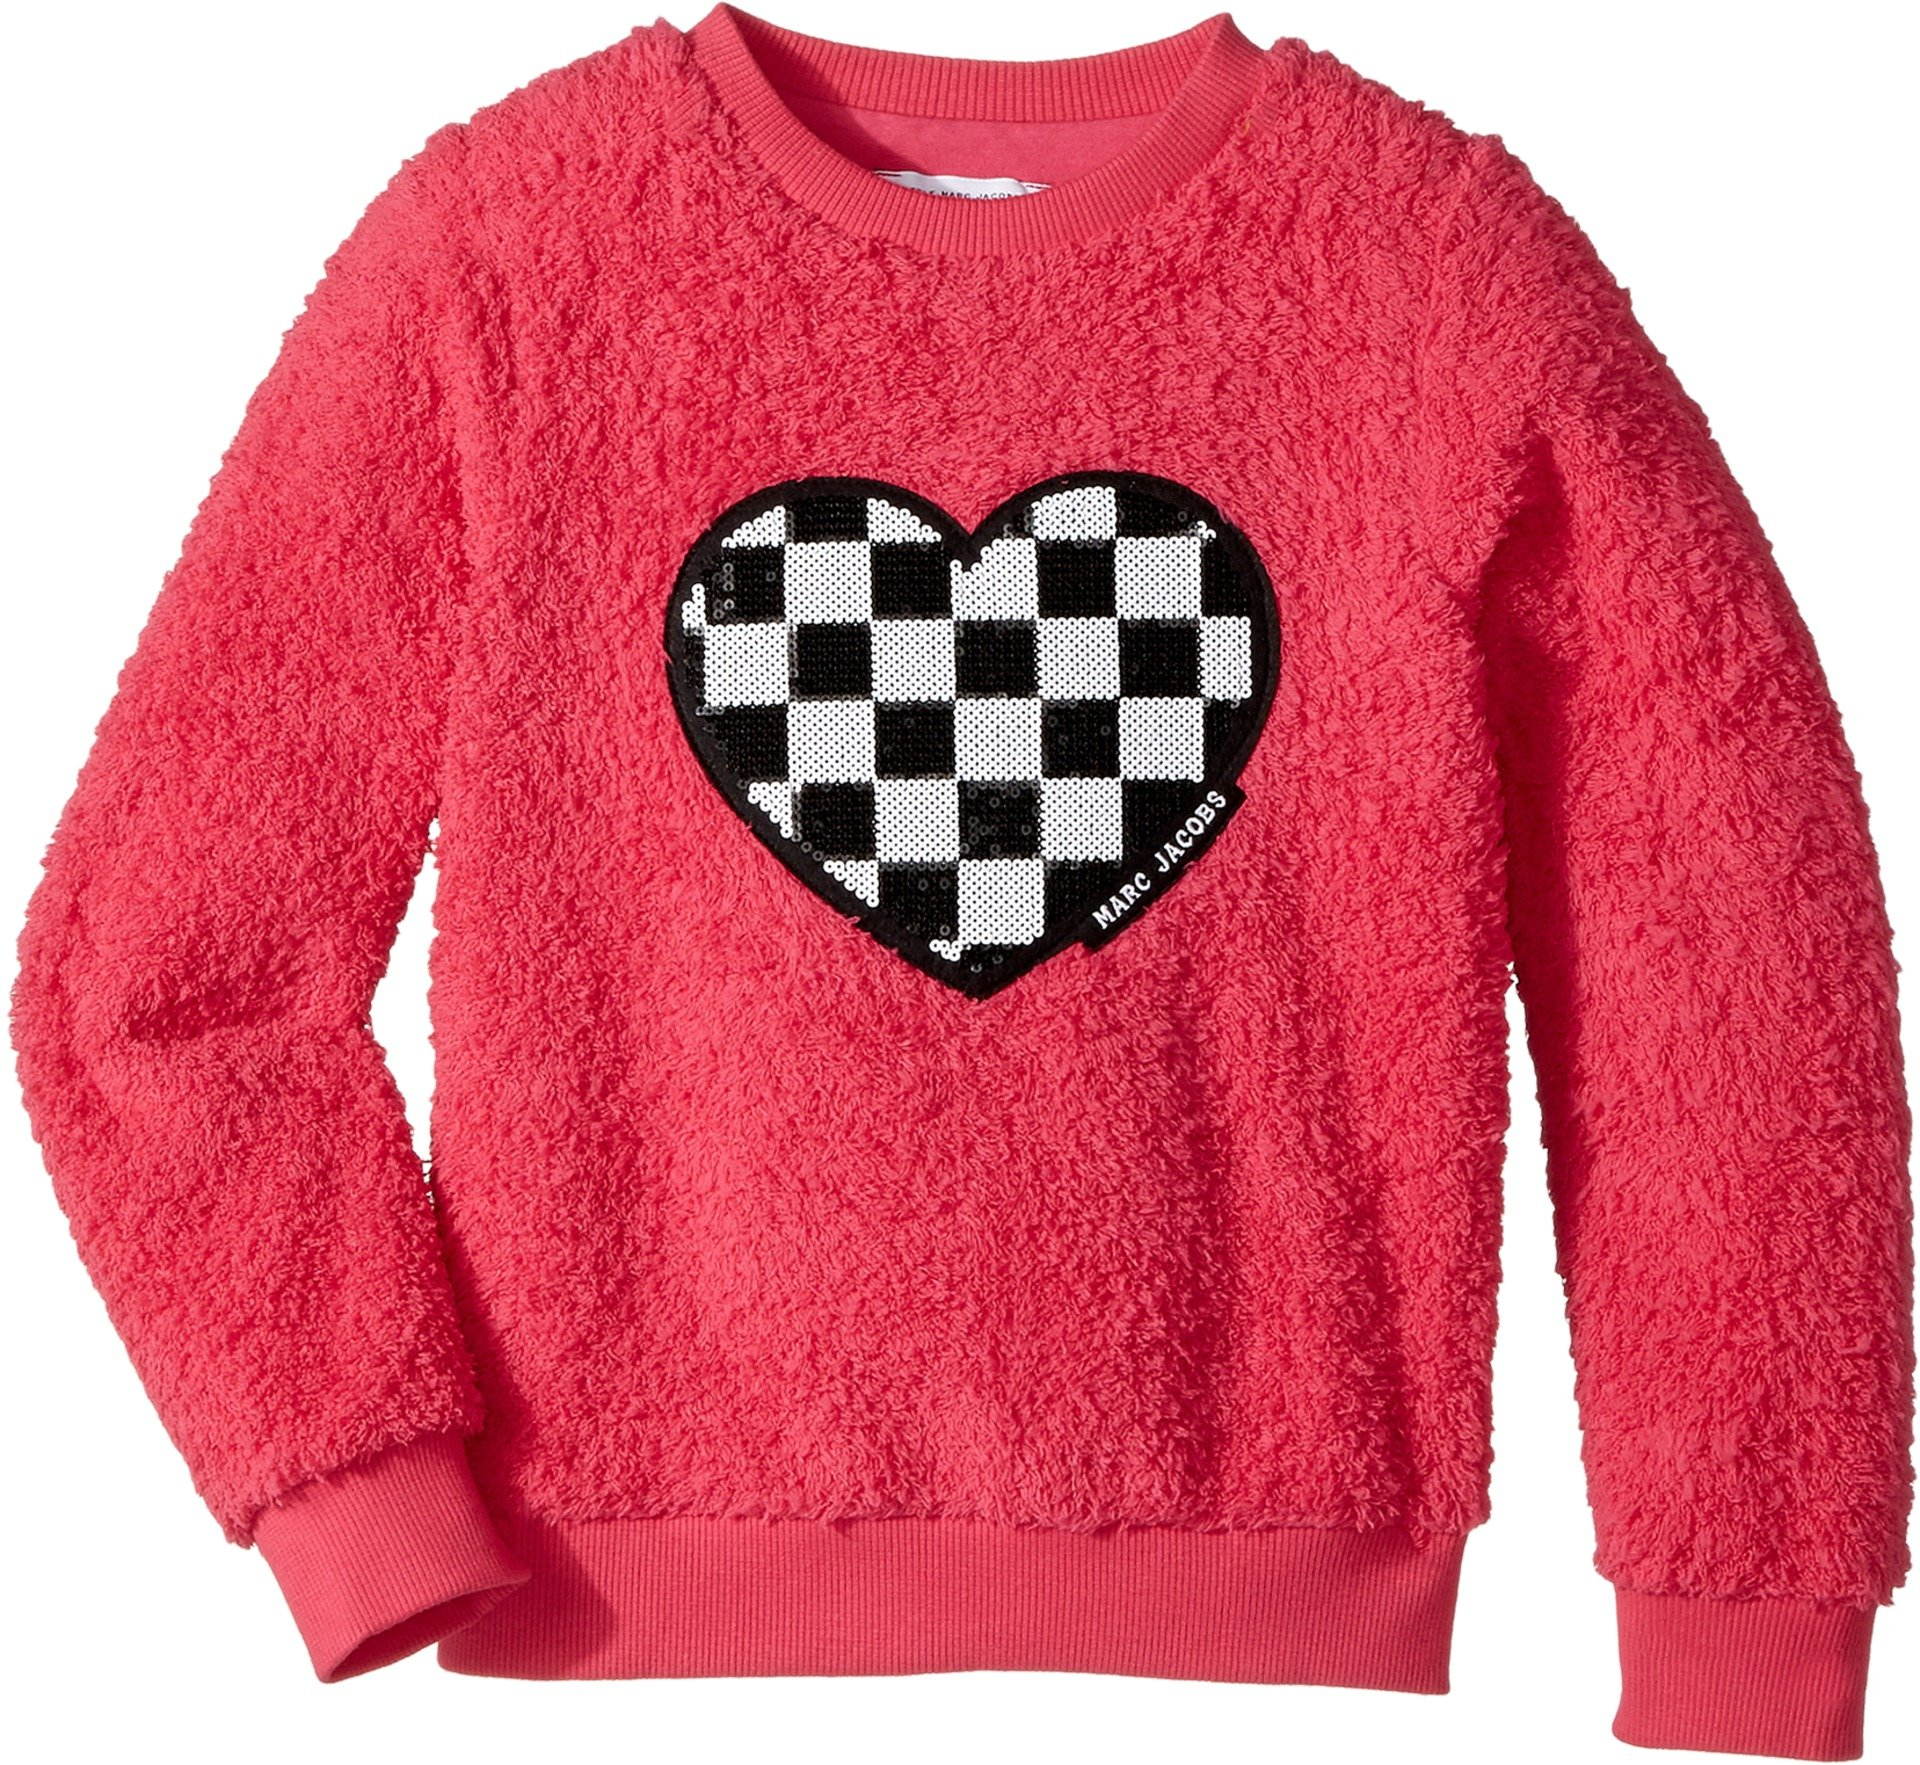 Little Marc Jacobs Girl's Soft Faux Fur Heart Illustration Long Sleeve Sweatshirt (Little Kids/Big Kids) Rose Ecar 8